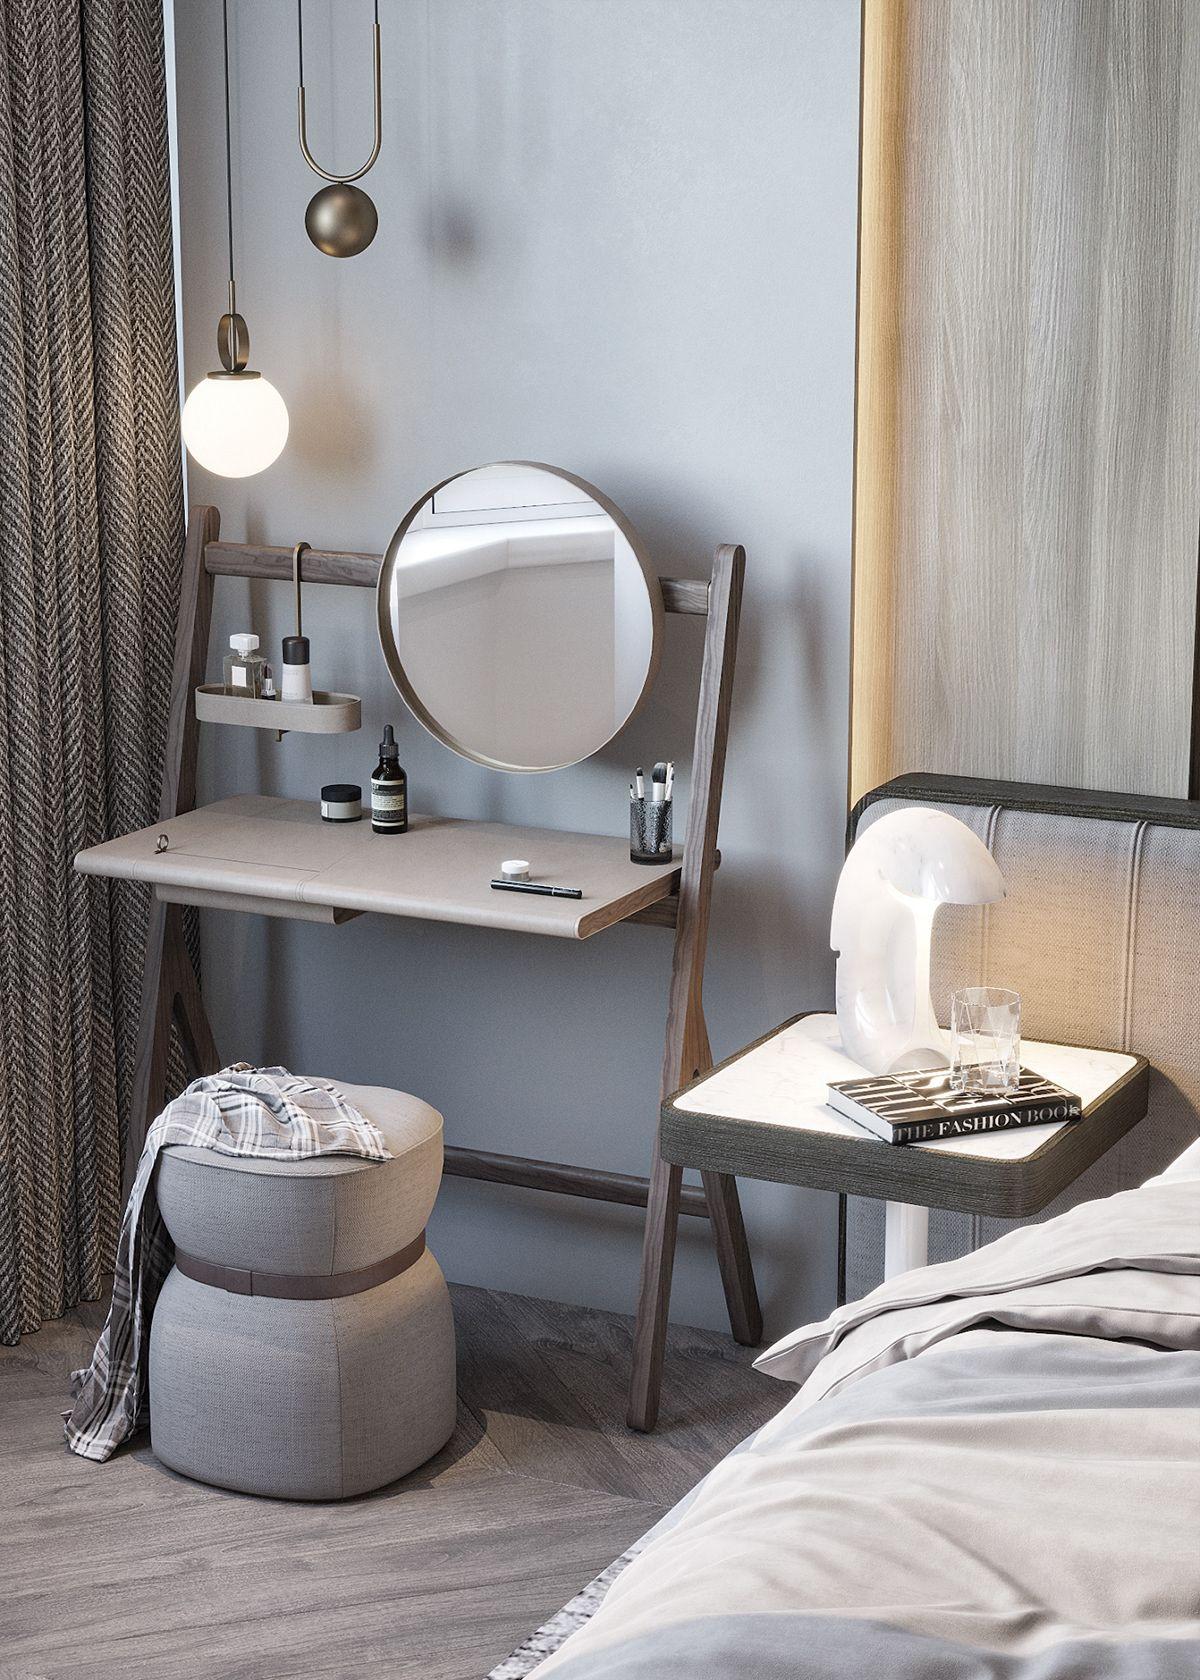 Bedroom visualization on Behance Pomysły na mieszkanie